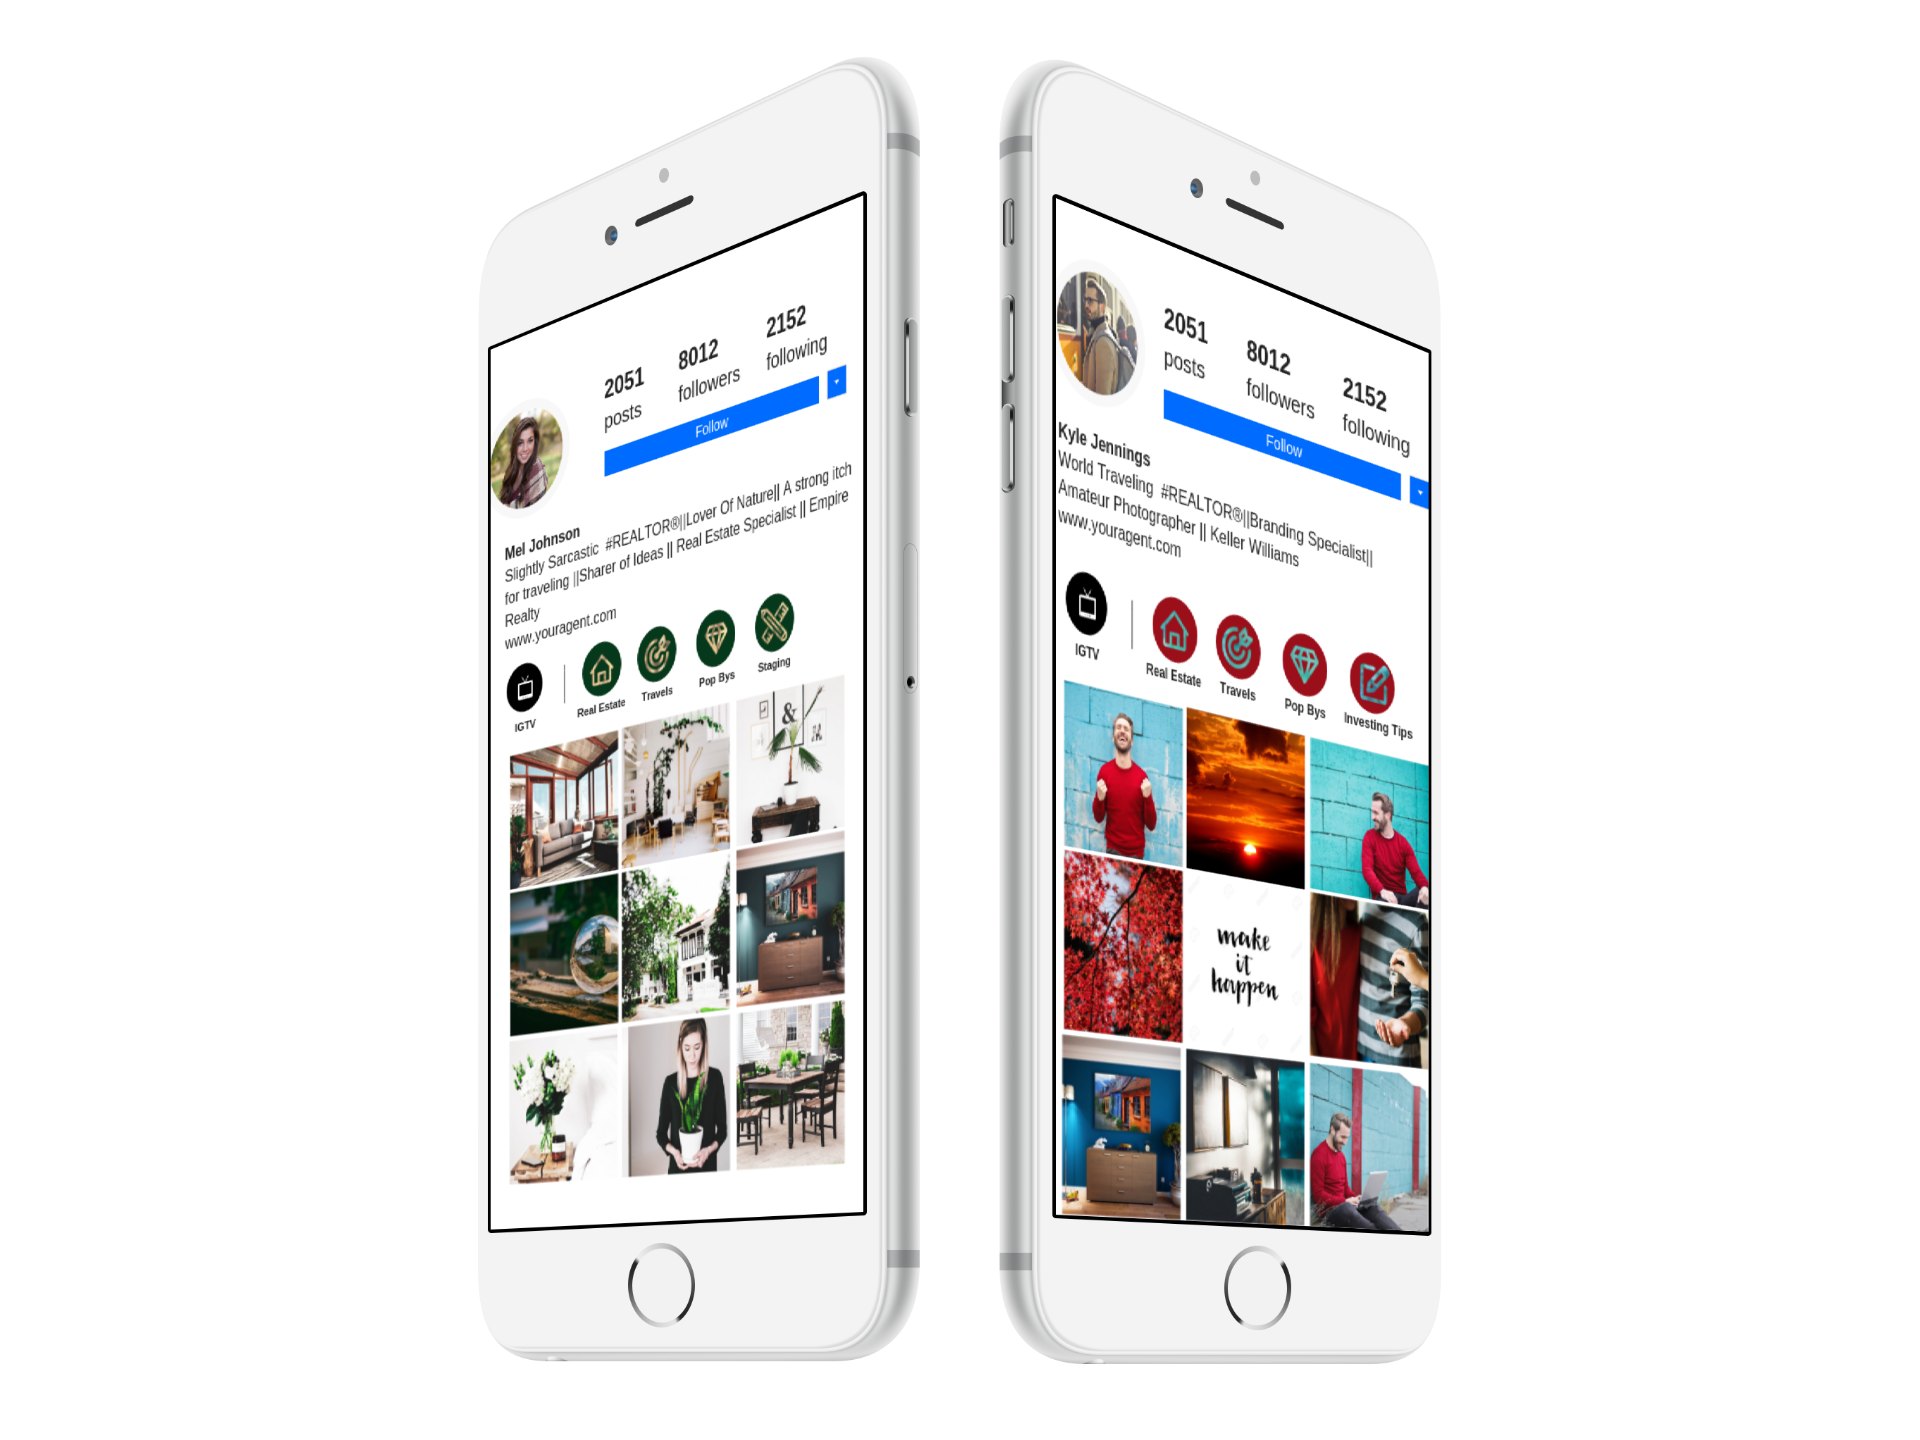 free Instagram Marketing Calendar - Get your hands on 30 FREE Instagram posts & 2 FREE real estate marketing videos!